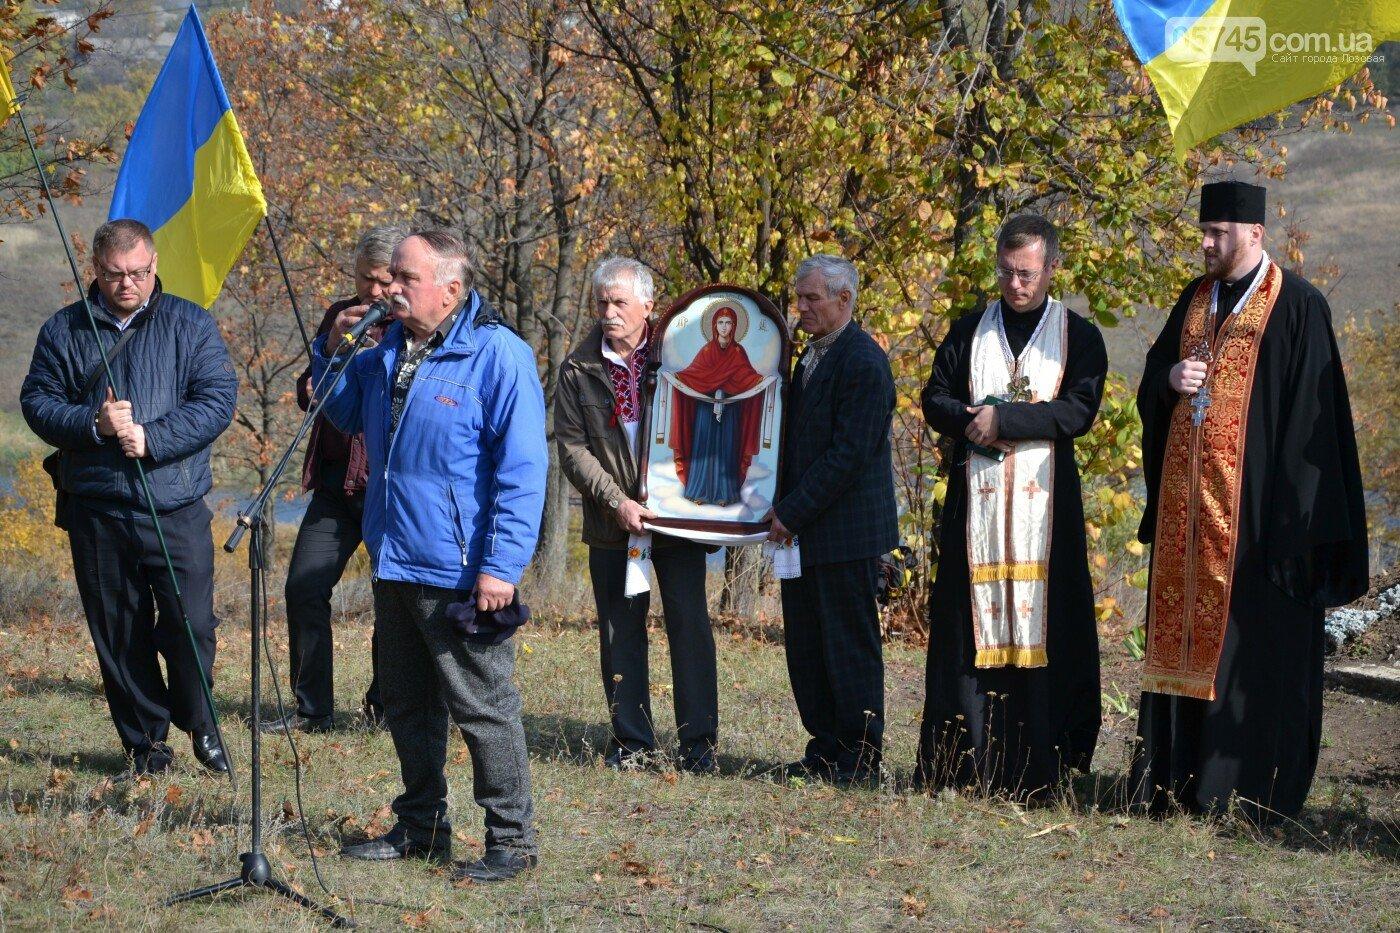 Без масок и карантина: как Лозовщина праздновала День защитника Украины год назад (ФОТО), фото-33